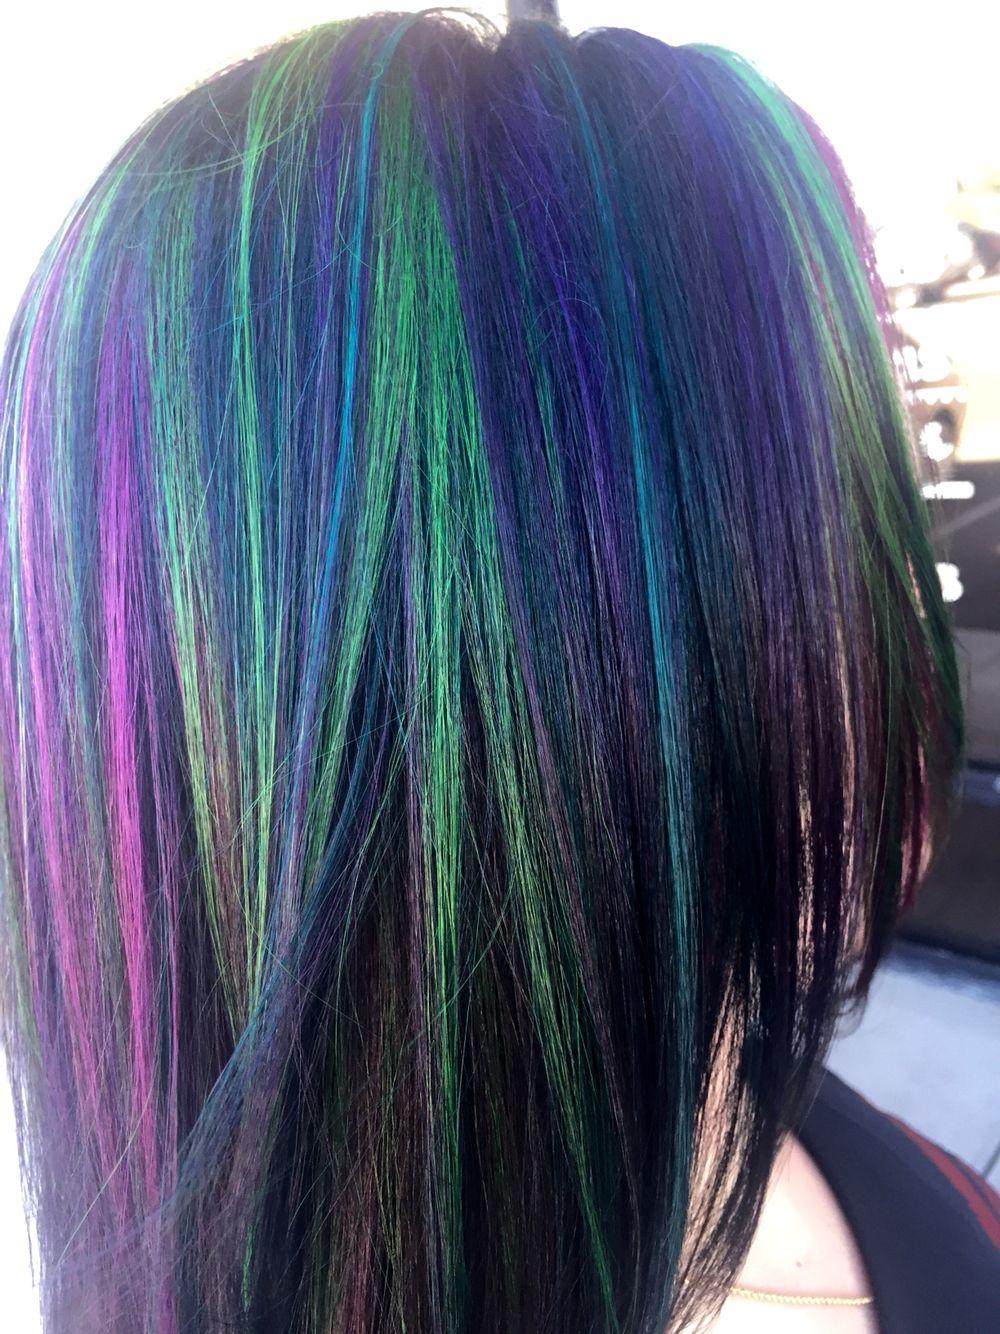 Multi Colored Highlights Green Highlights Hot Pink Highlights Purple Highlights Blue Highlights Dark Brown Peacock Hair Color Lemon Hair Dark Purple Hair